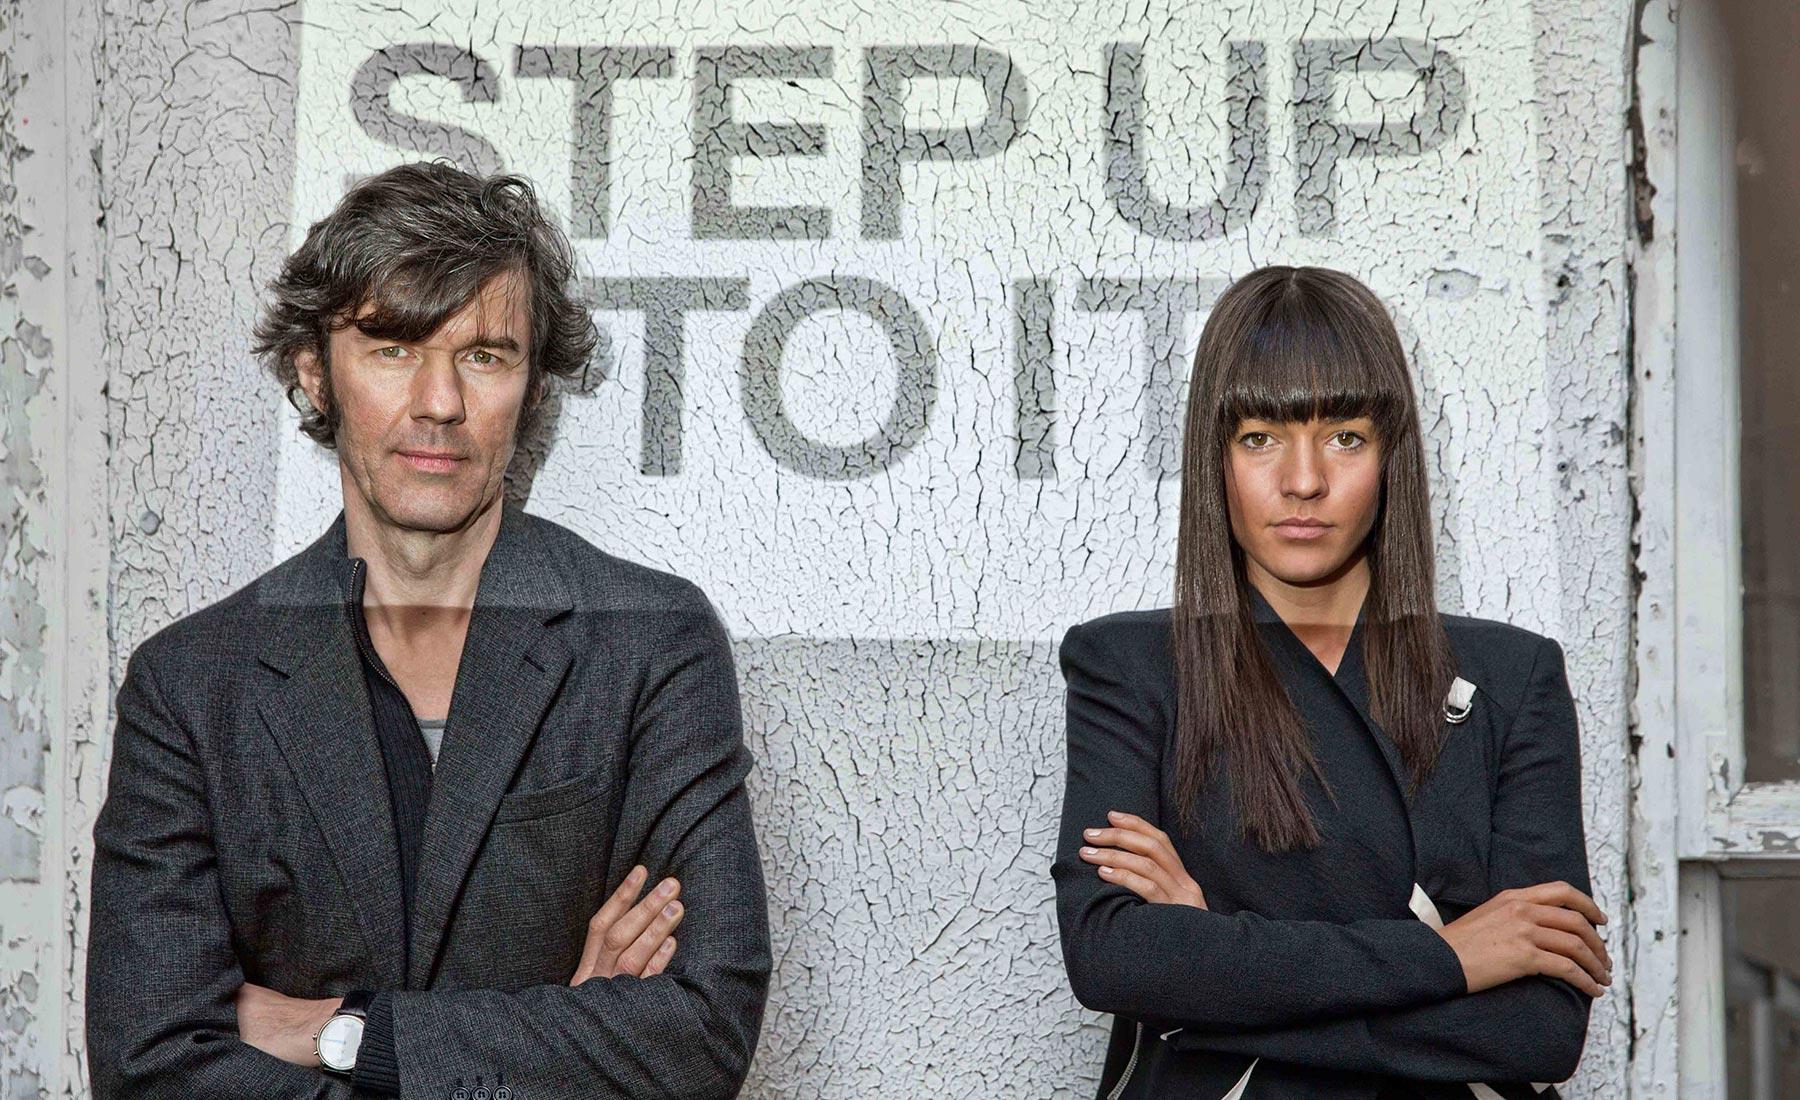 Sagmeister-Beauty-Talk-Vienna-Sagmeister-Walsh